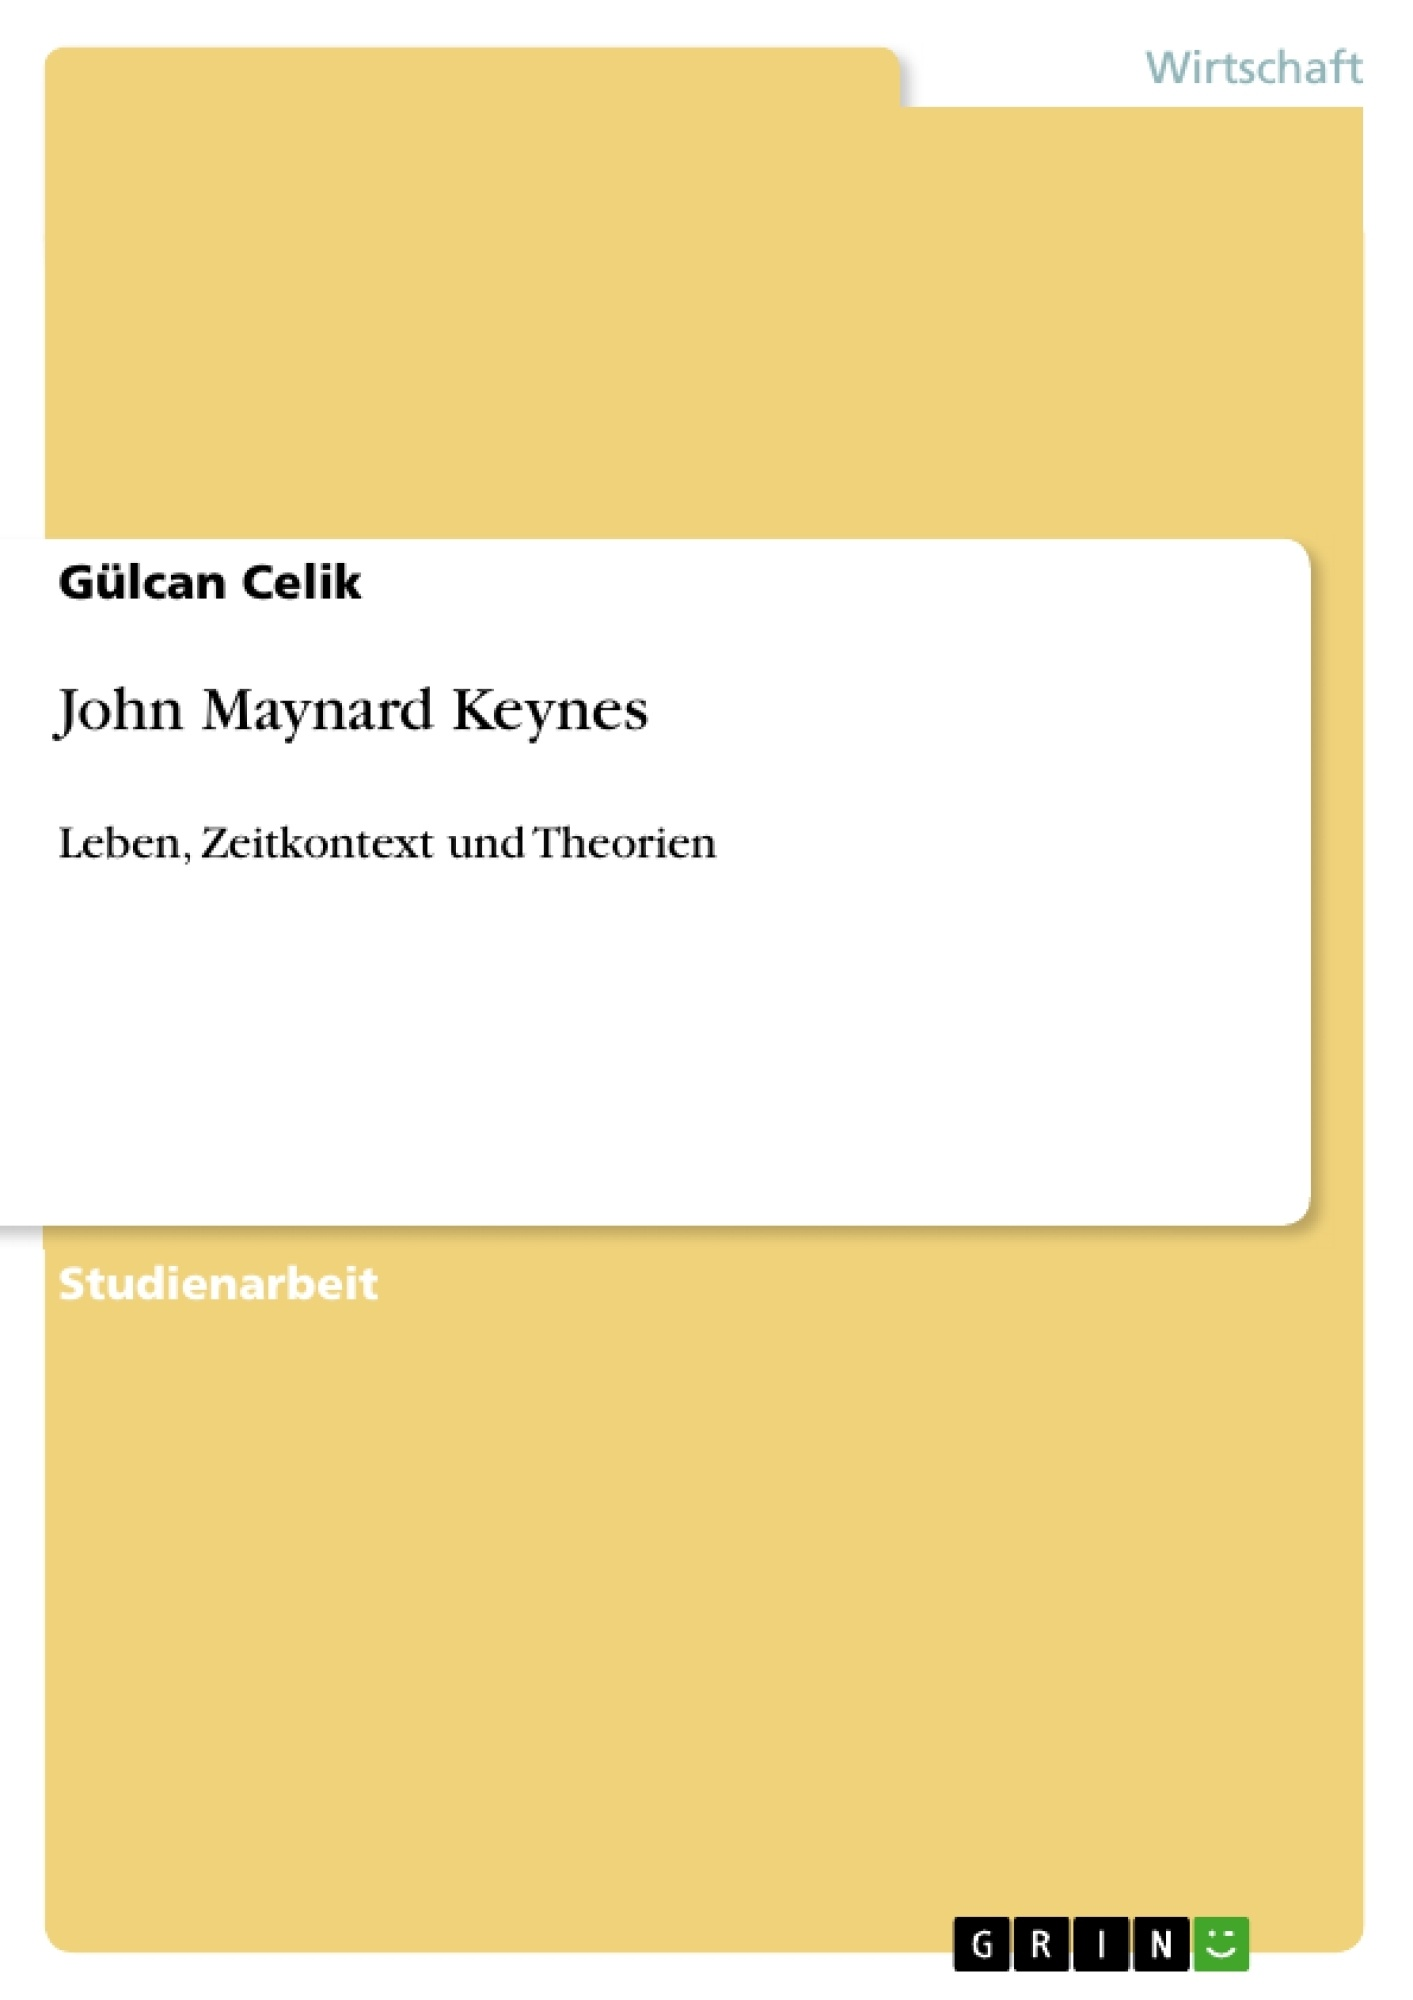 Titel: John Maynard Keynes